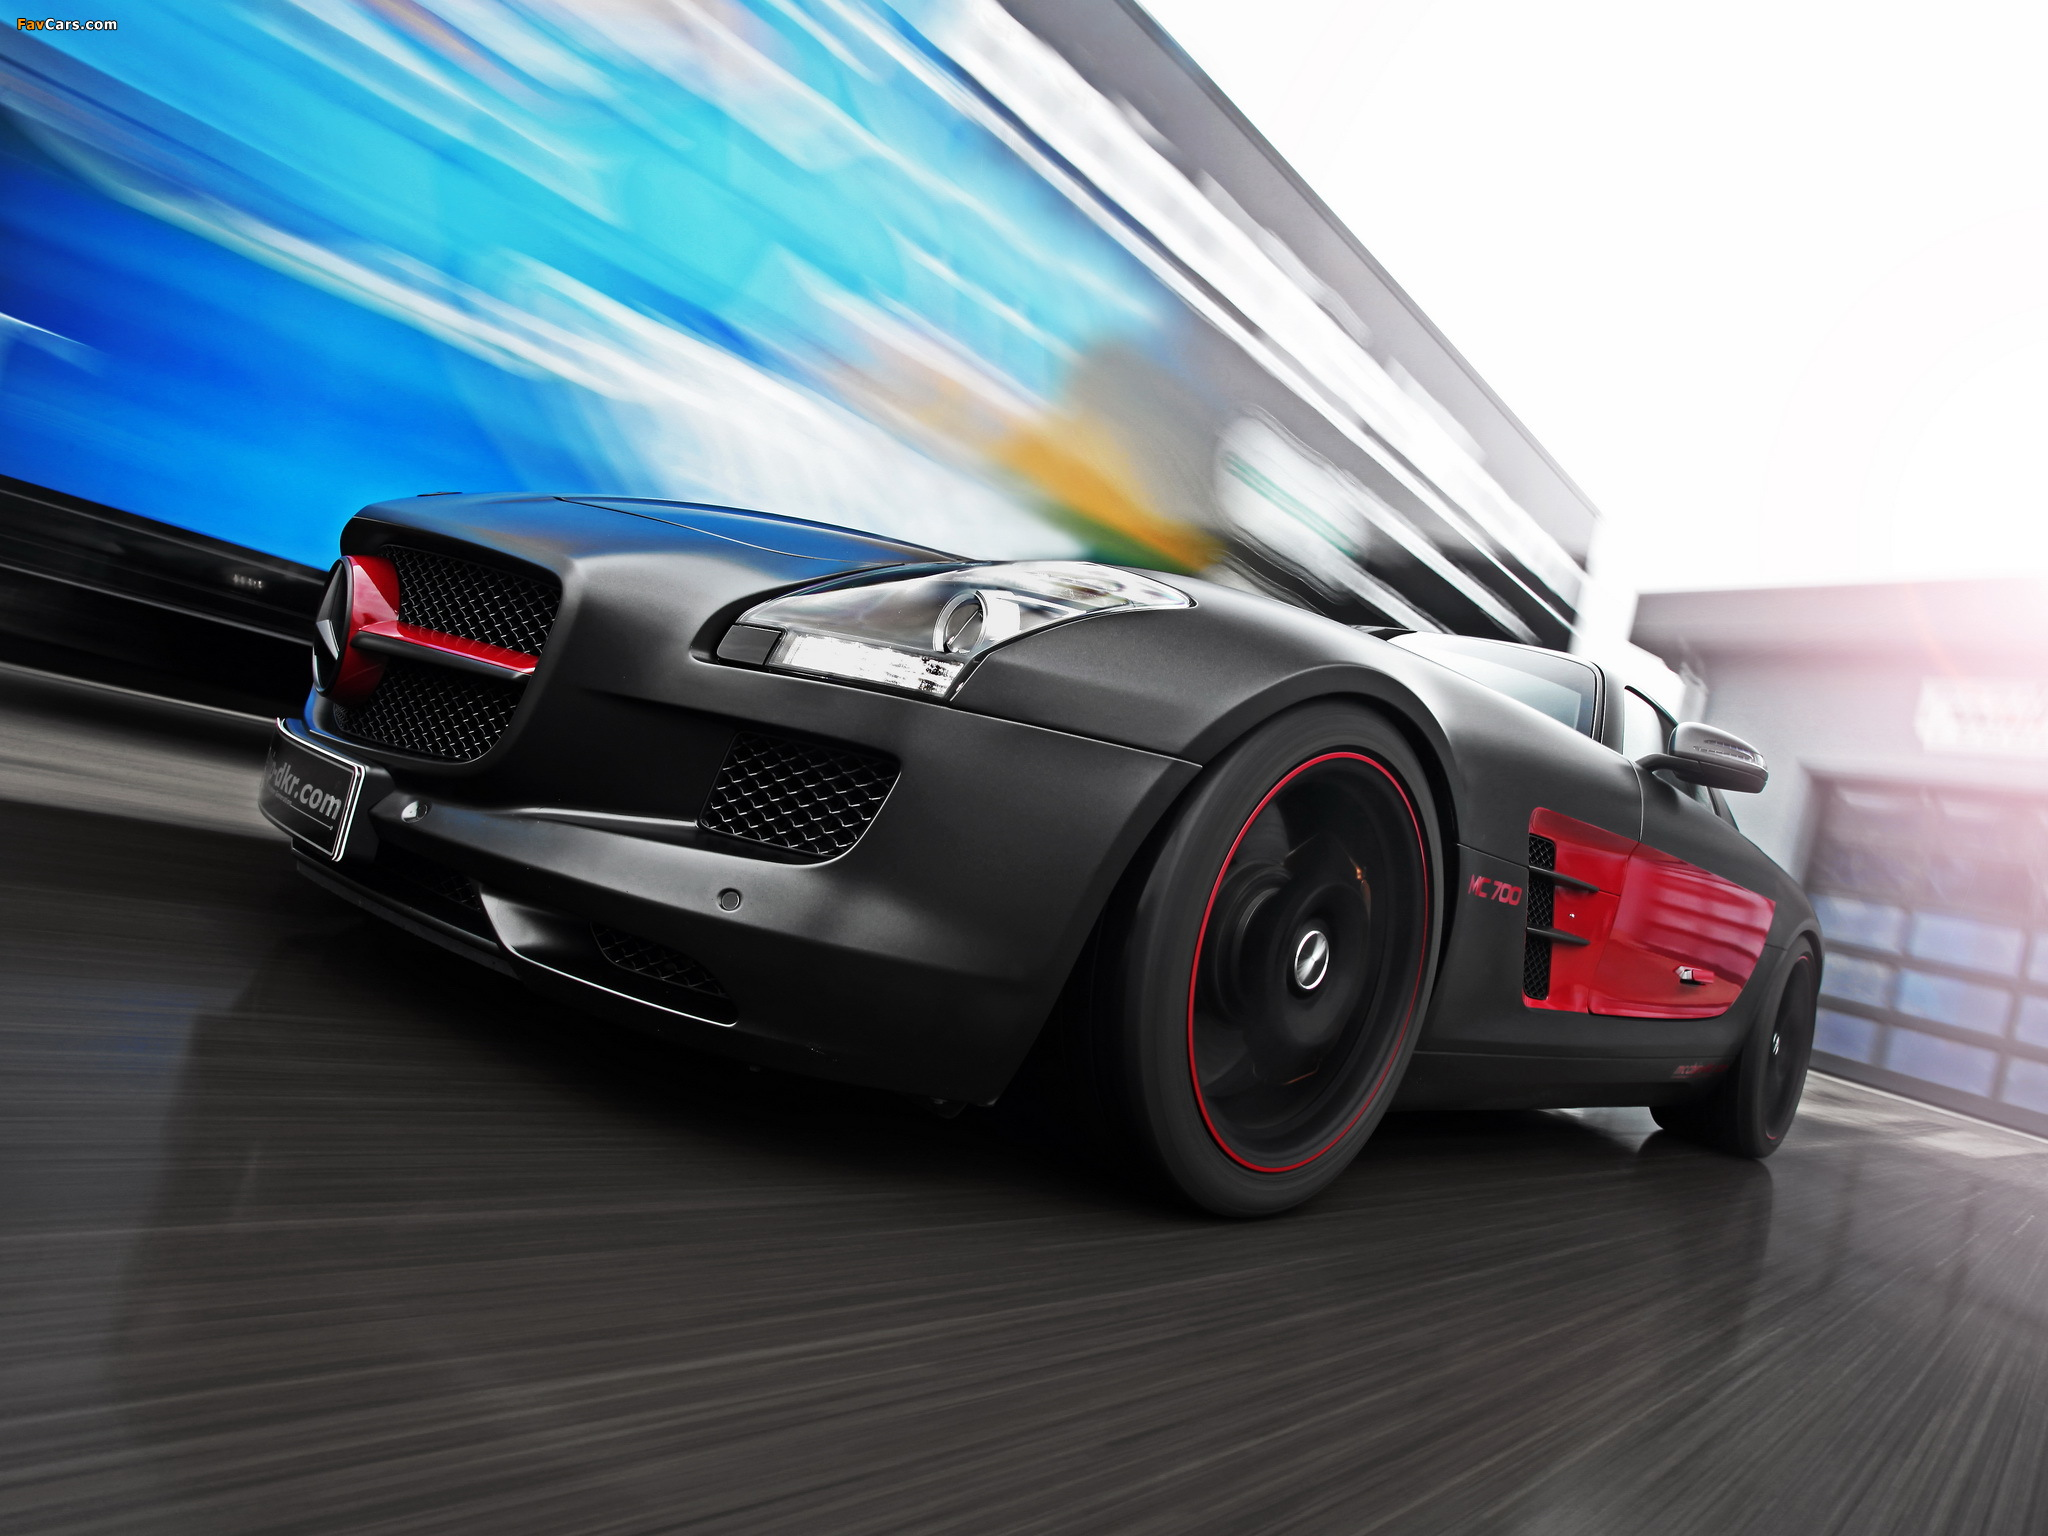 Mcchip-DKR Mercedes-Benz SLS 63 AMG MC 700 (C197) 2012 wallpapers (2048 x 1536)